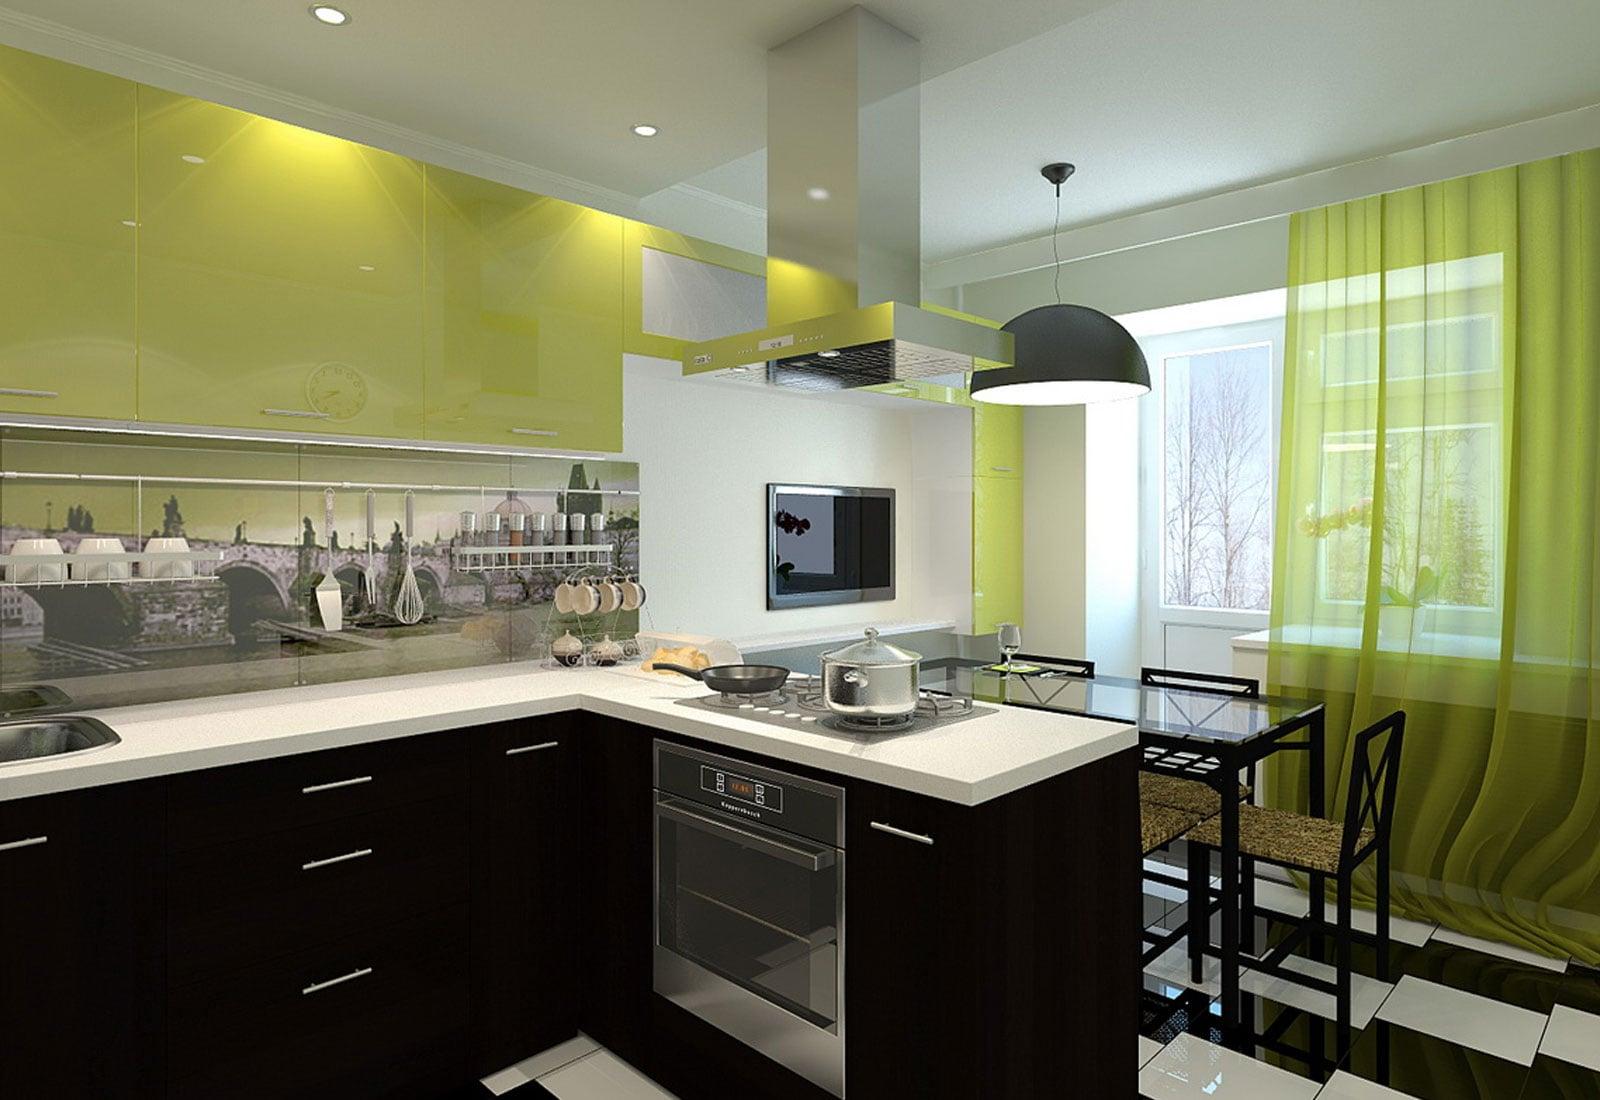 кухня на заказ в москве икеа мдф цена 100 000